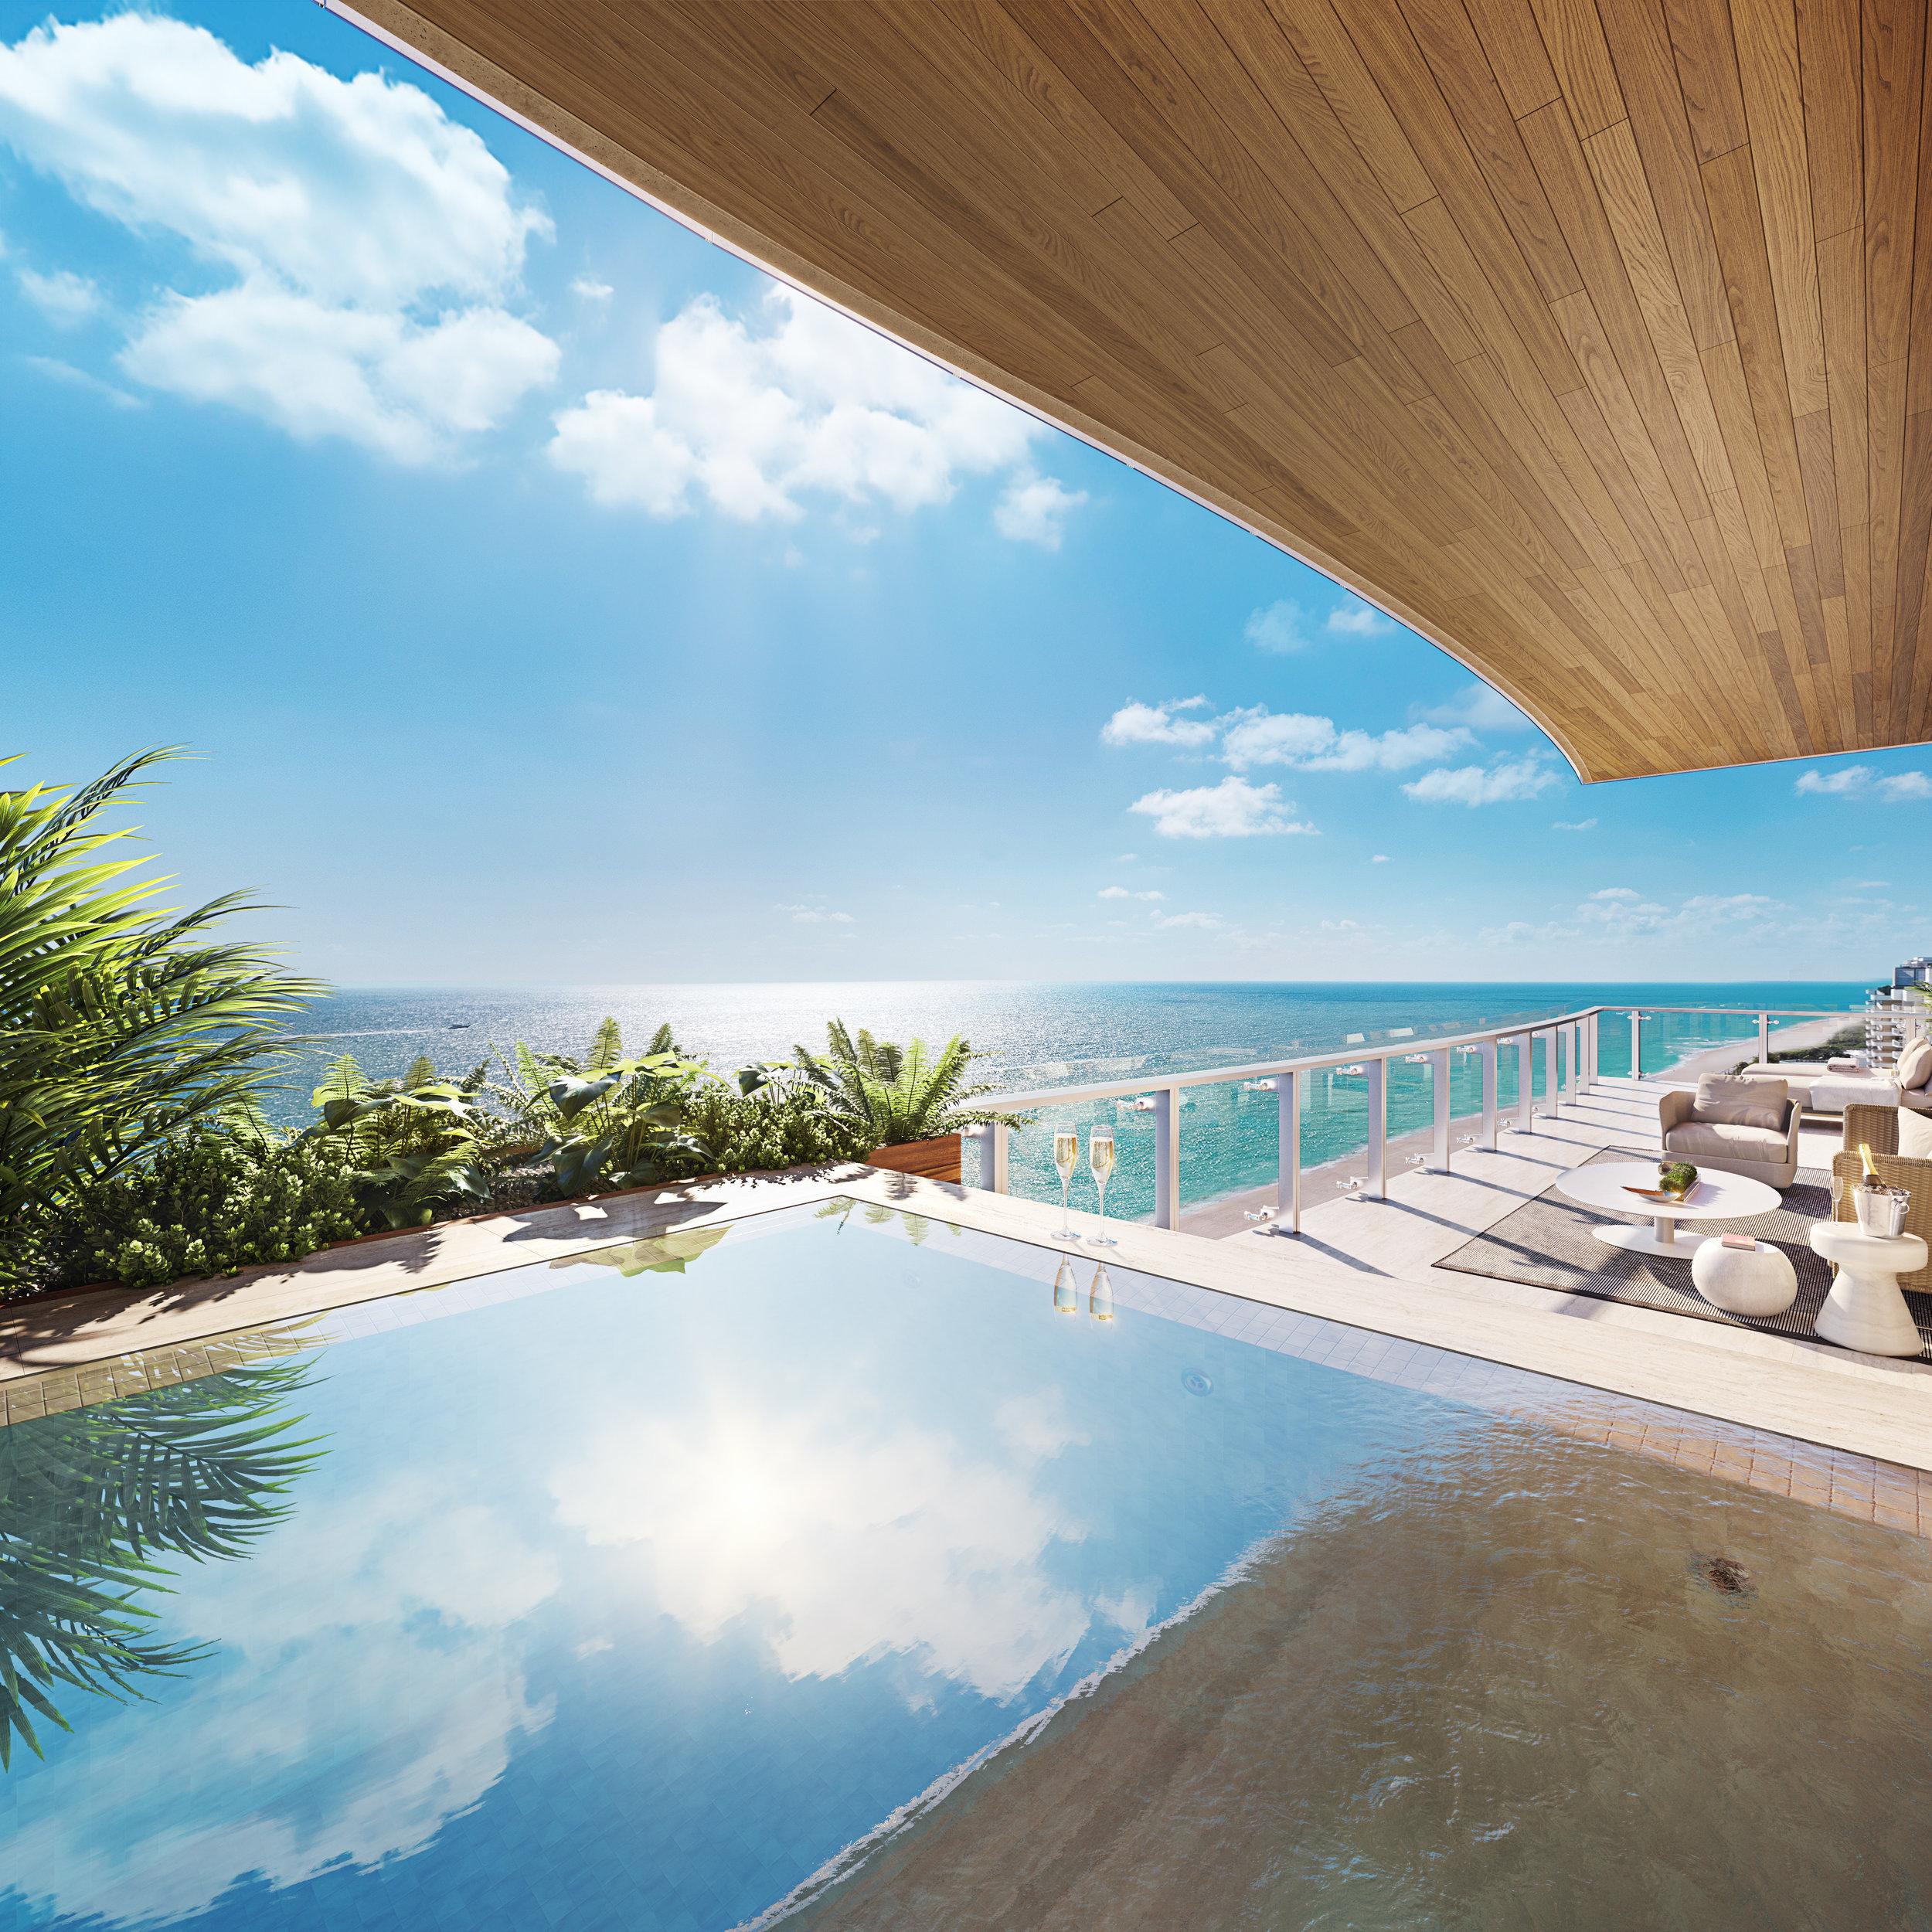 MultiplanREAM's 57 Ocean Reveals Ten Sky Residences Including Exclusive Penthouse Duplex